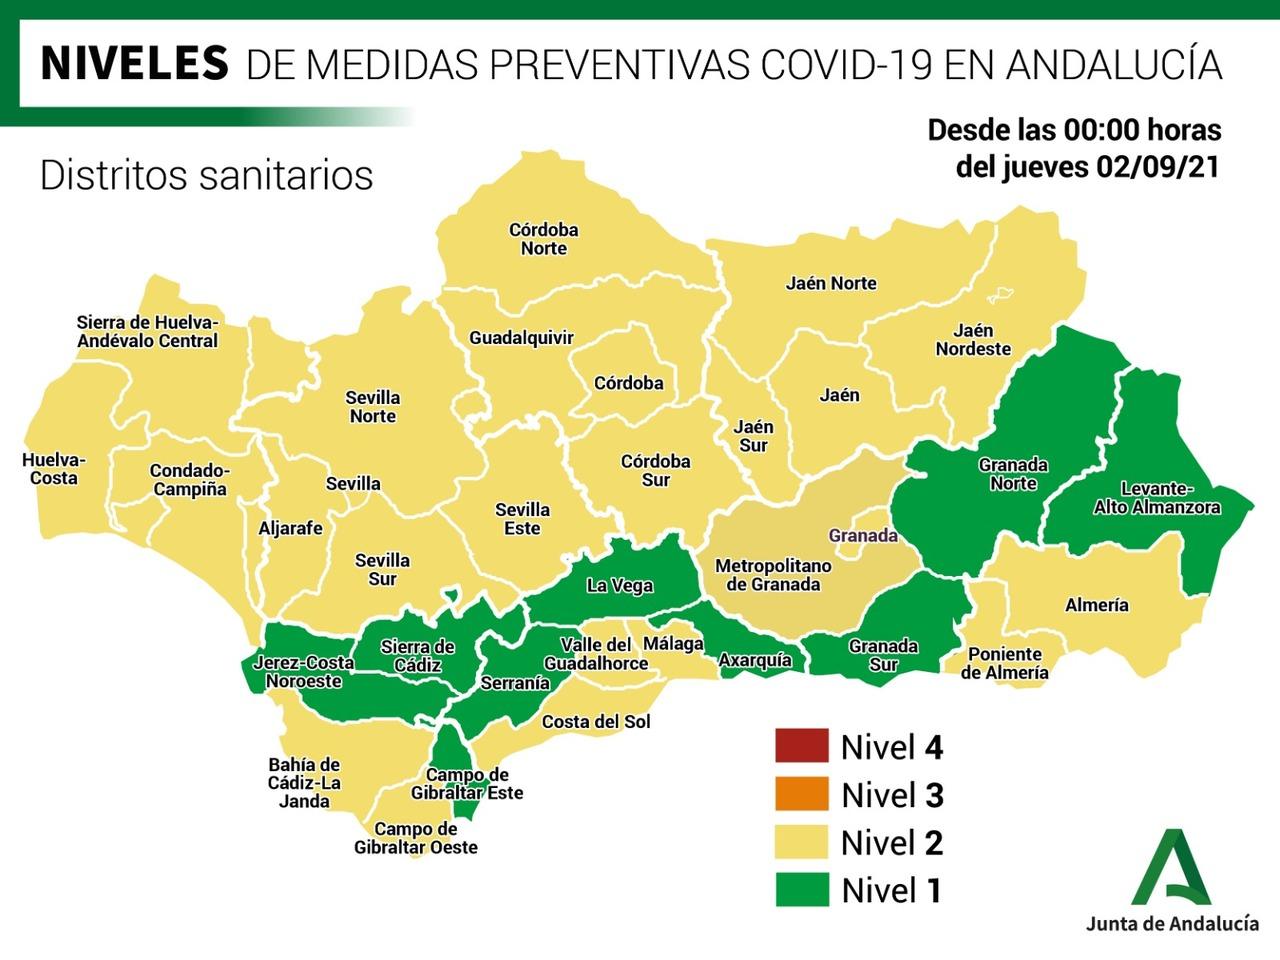 https://www.palmadelrio.es/sites/default/files/mapa_andalucia_covid_de_02.09.21_n.jpg